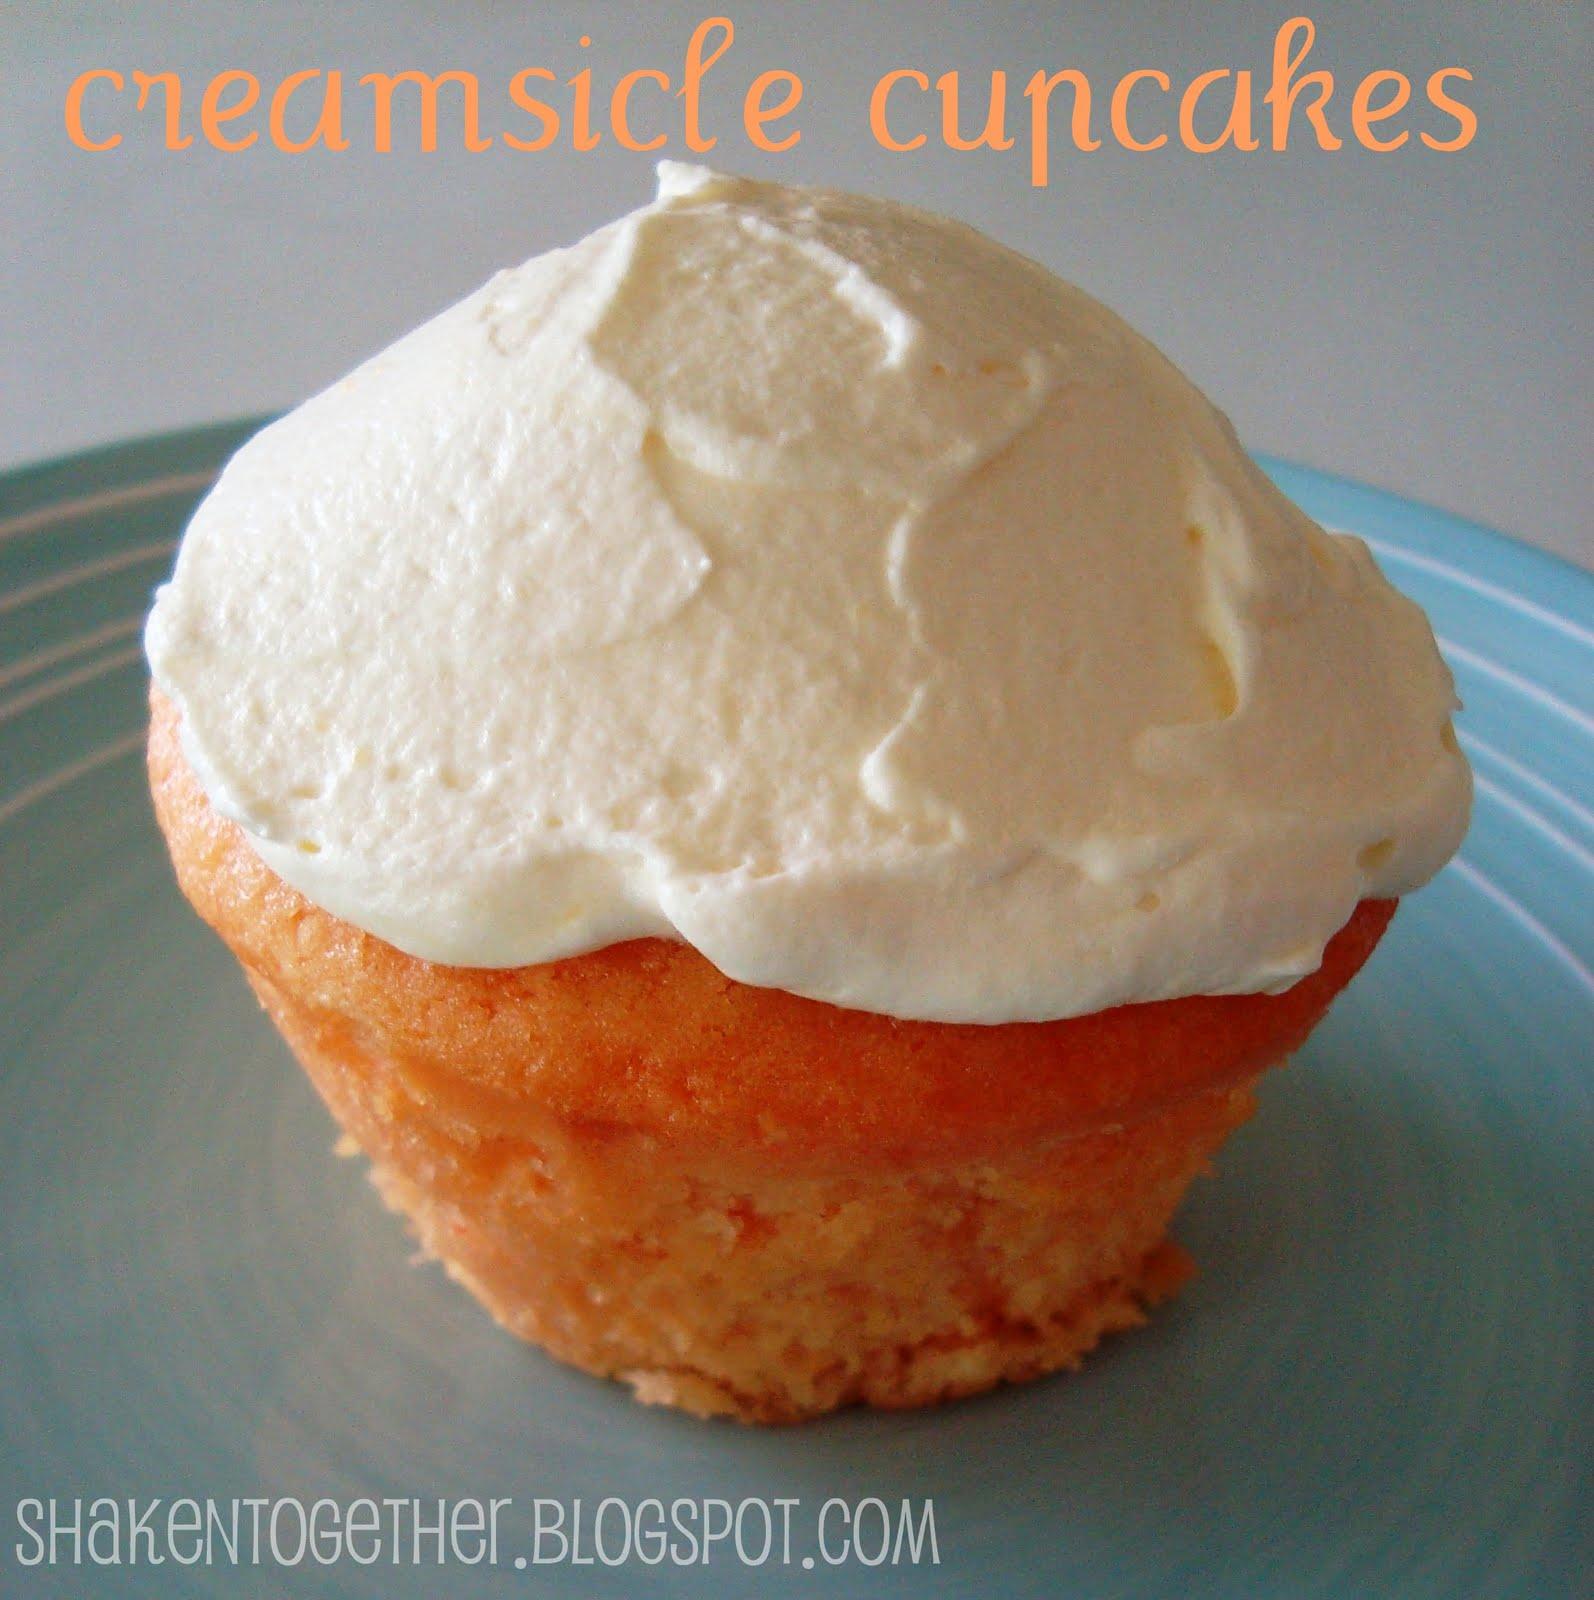 taste this} Creamsicle Cupcakes - Shaken Together